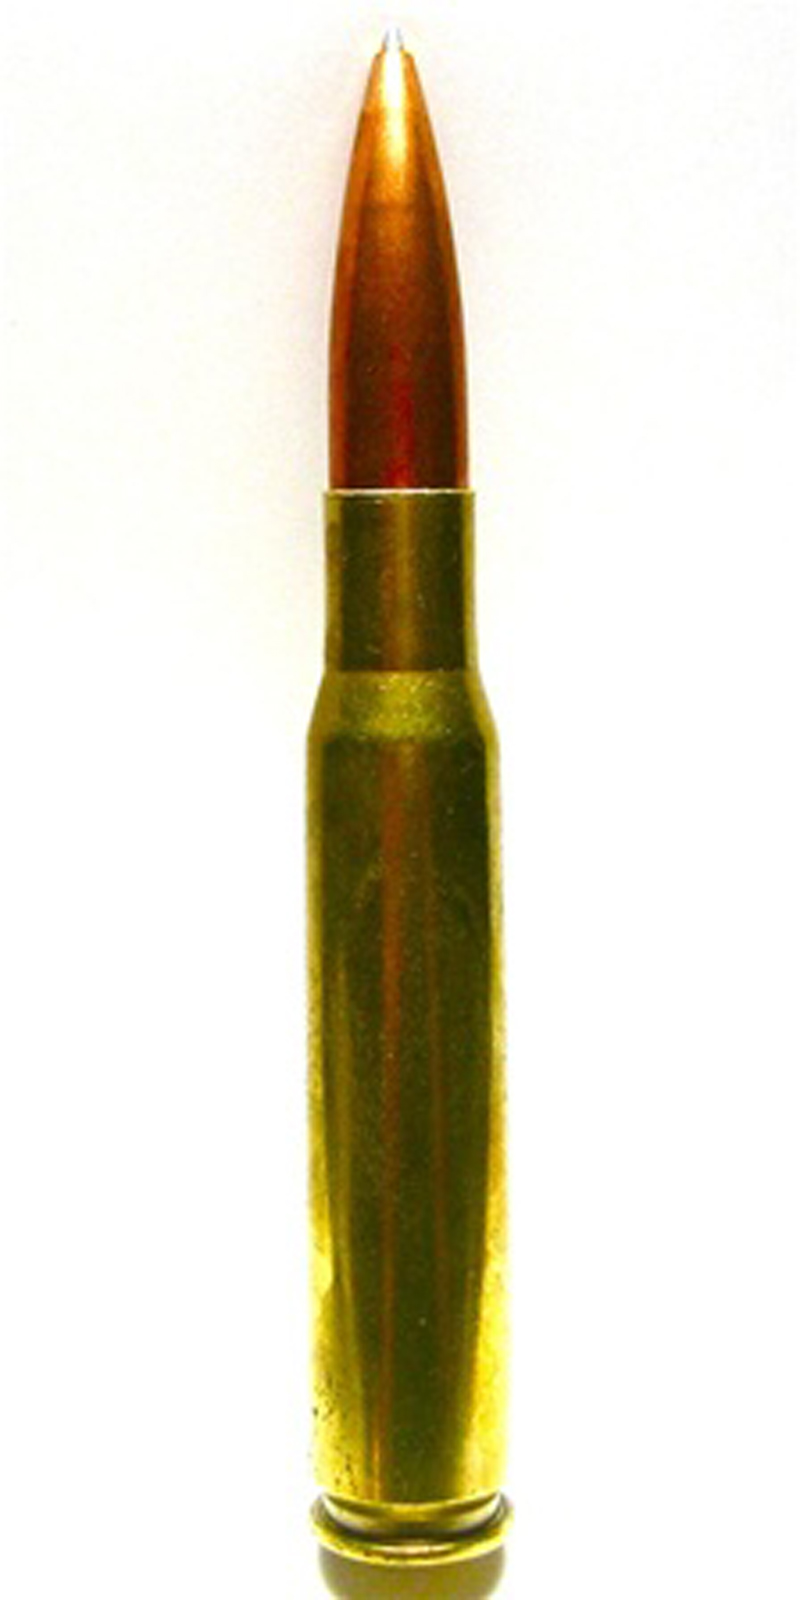 50 caliber machine gun bullet